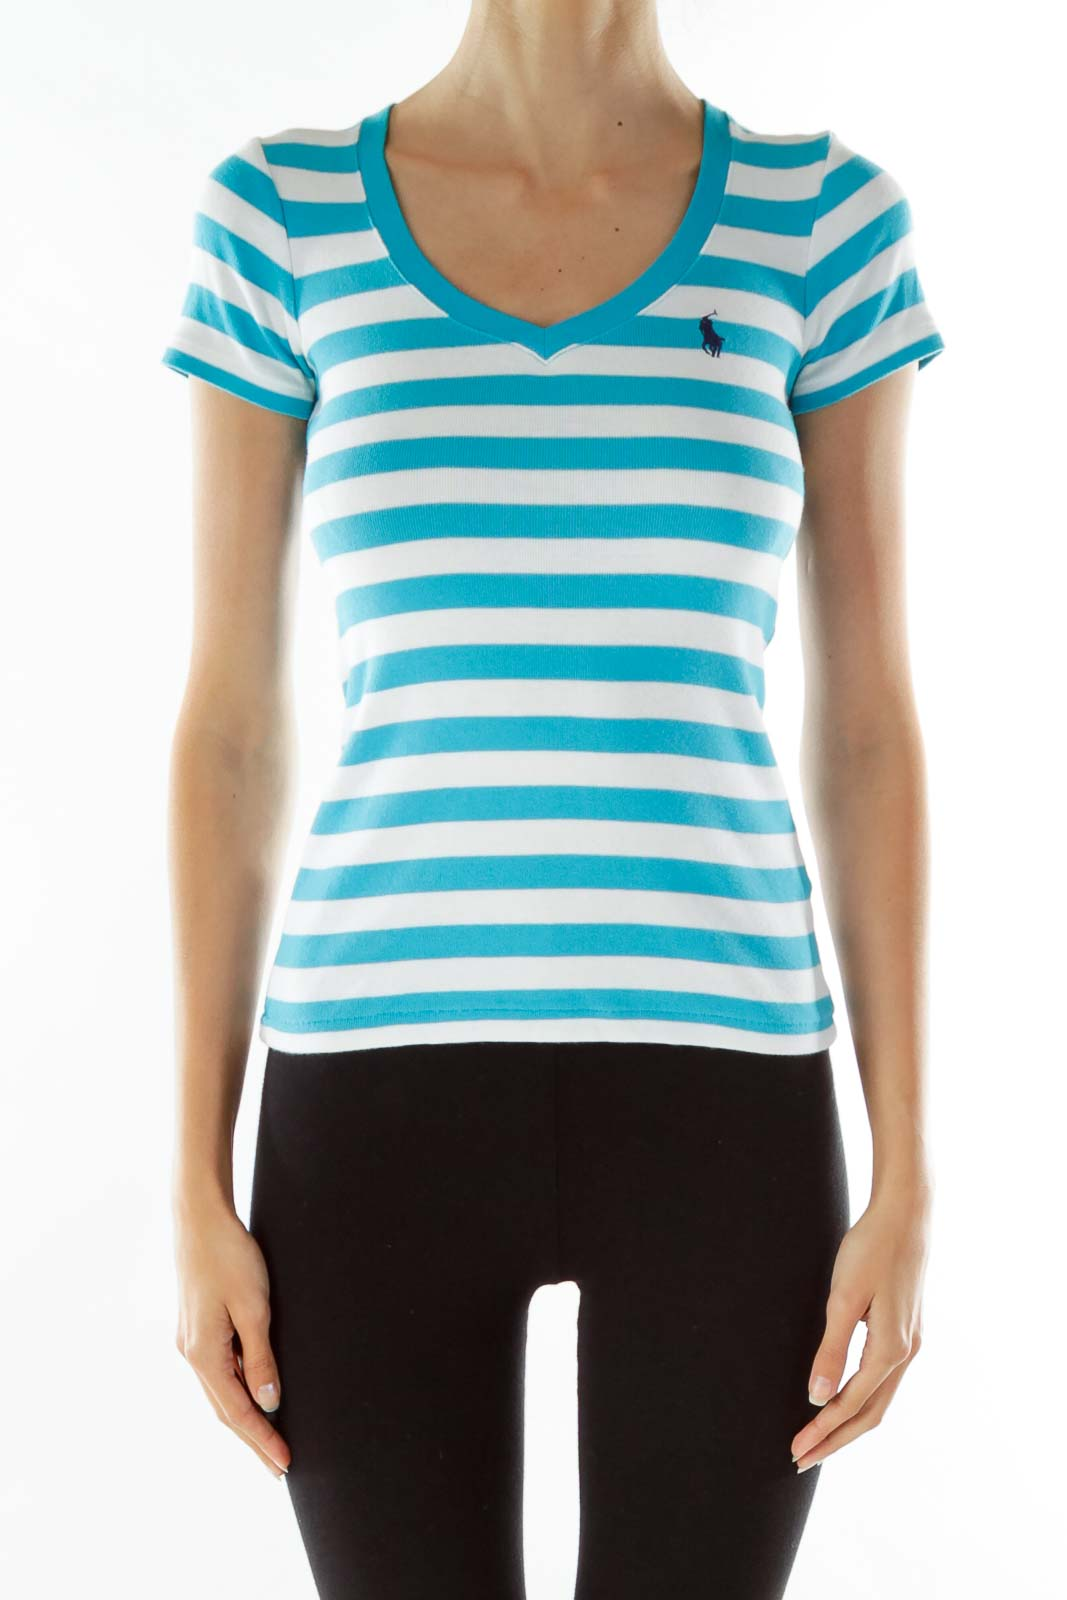 Blue White Striped V-Neck T-shirt Front